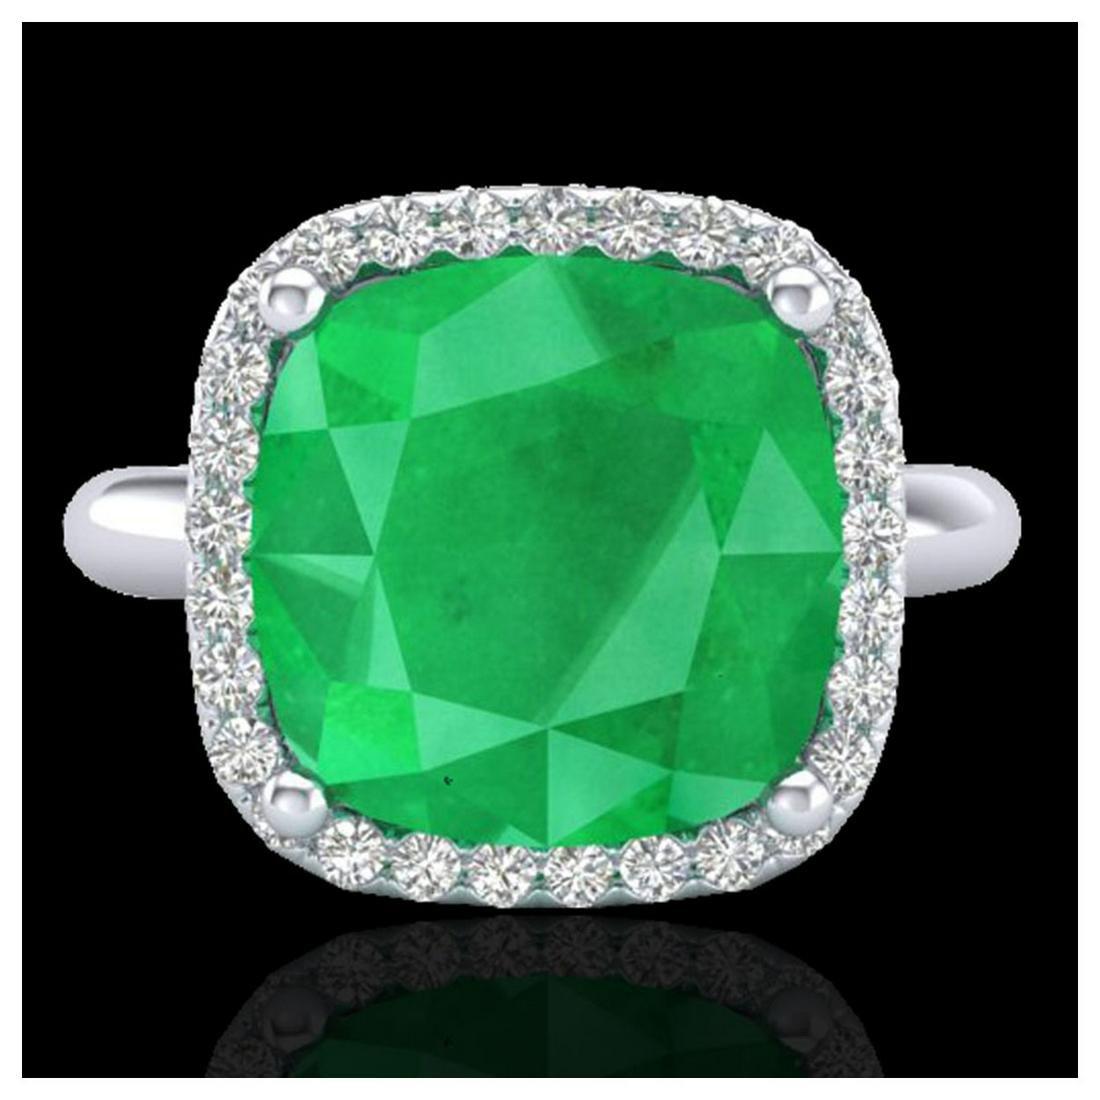 6 ctw Emerald And Halo VS/SI Diamond Ring 18K White